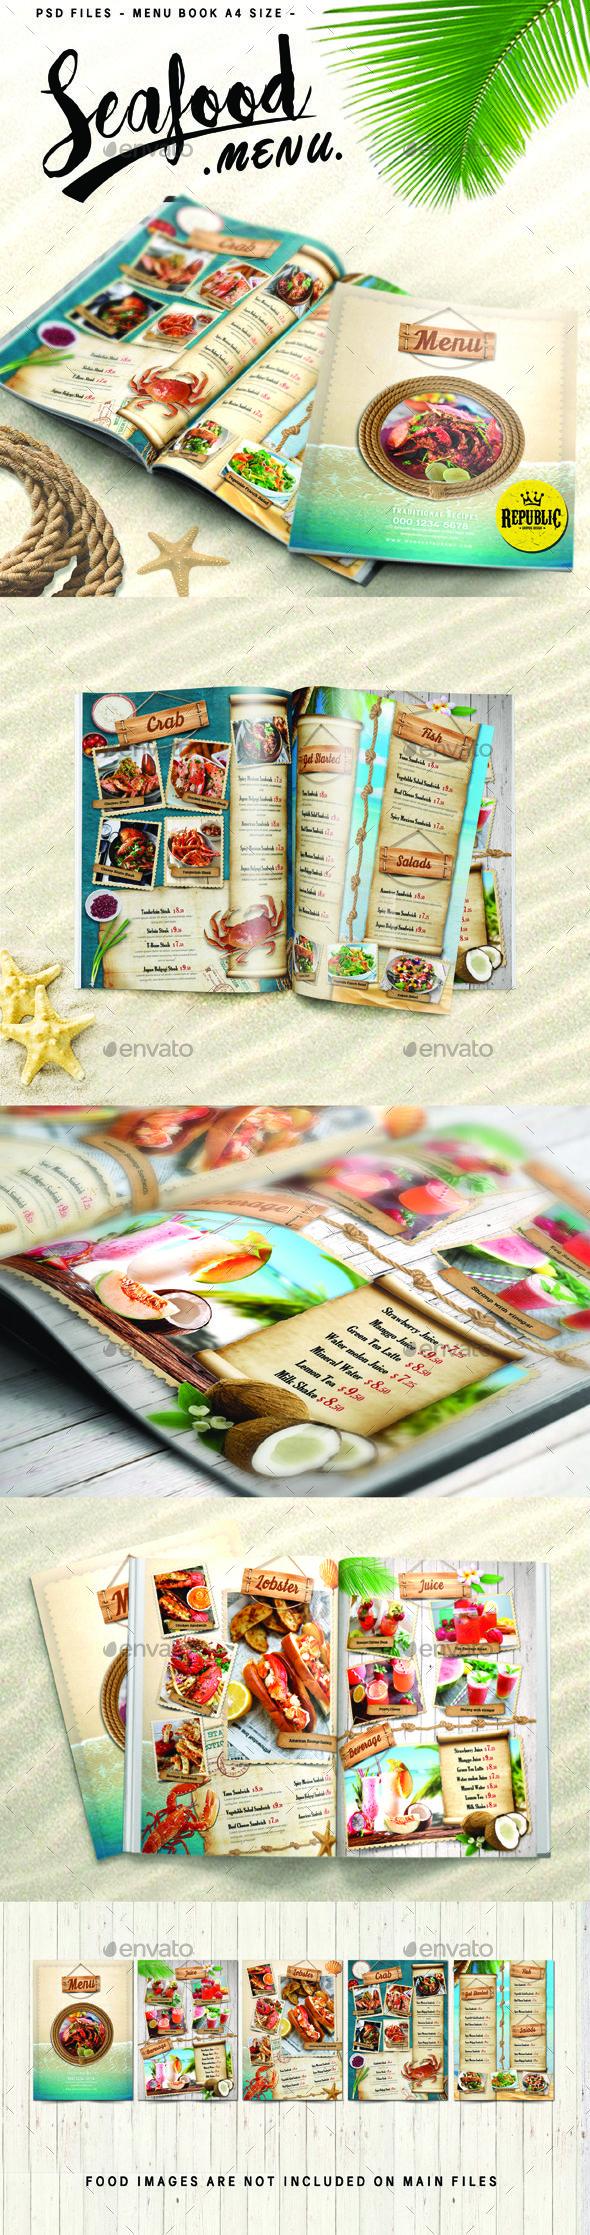 Seafood Menu - Food Menus Print Templates Download here : https://graphicriver.net/item/seafood-menu/19220640?s_rank=82&ref=Al-fatih